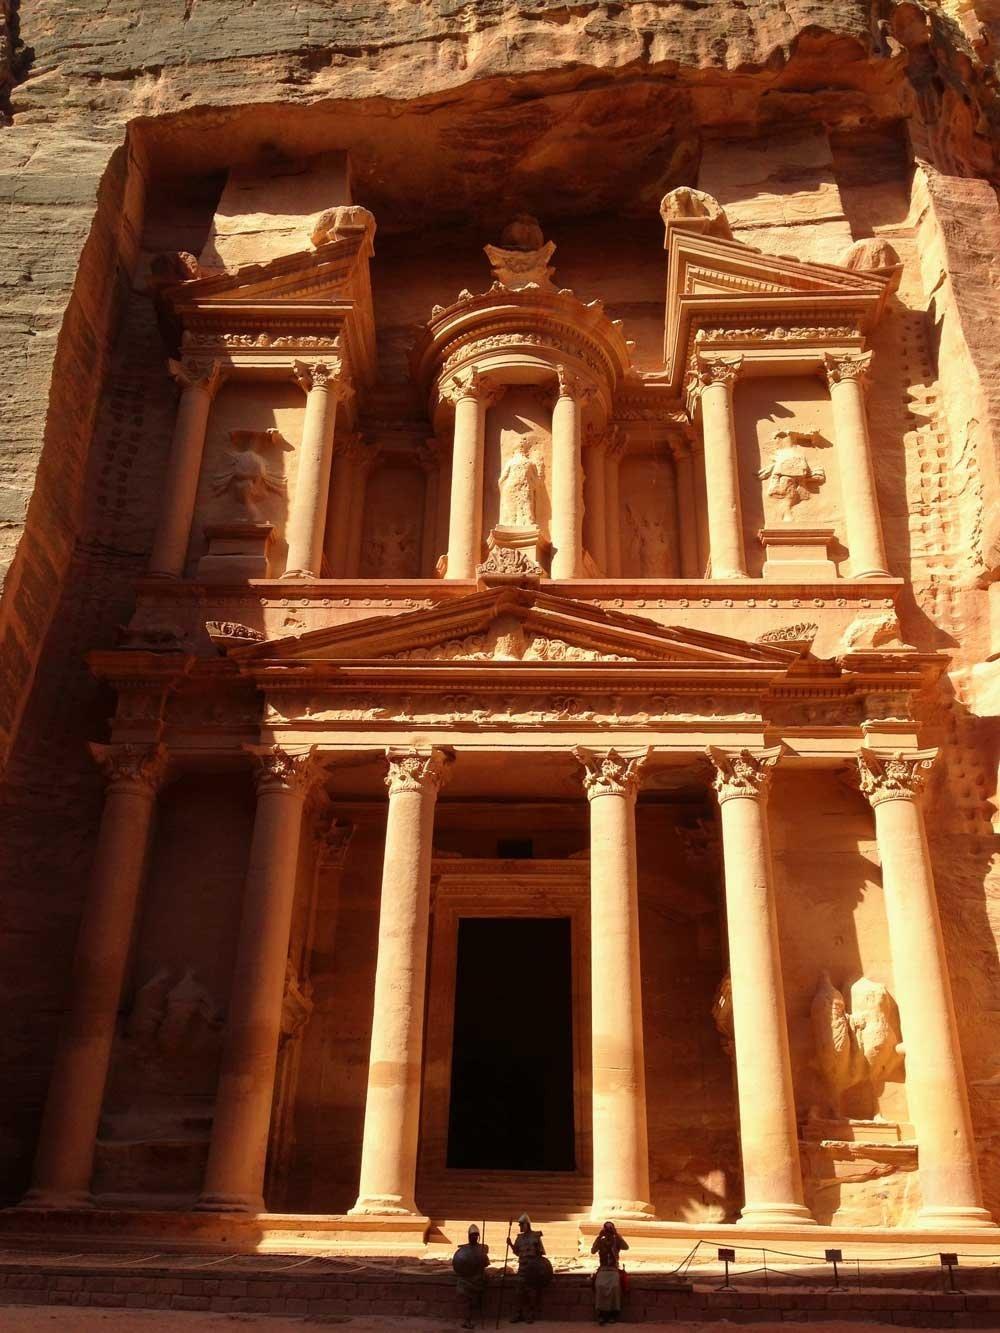 Tips for exploring Petra: The Treasury